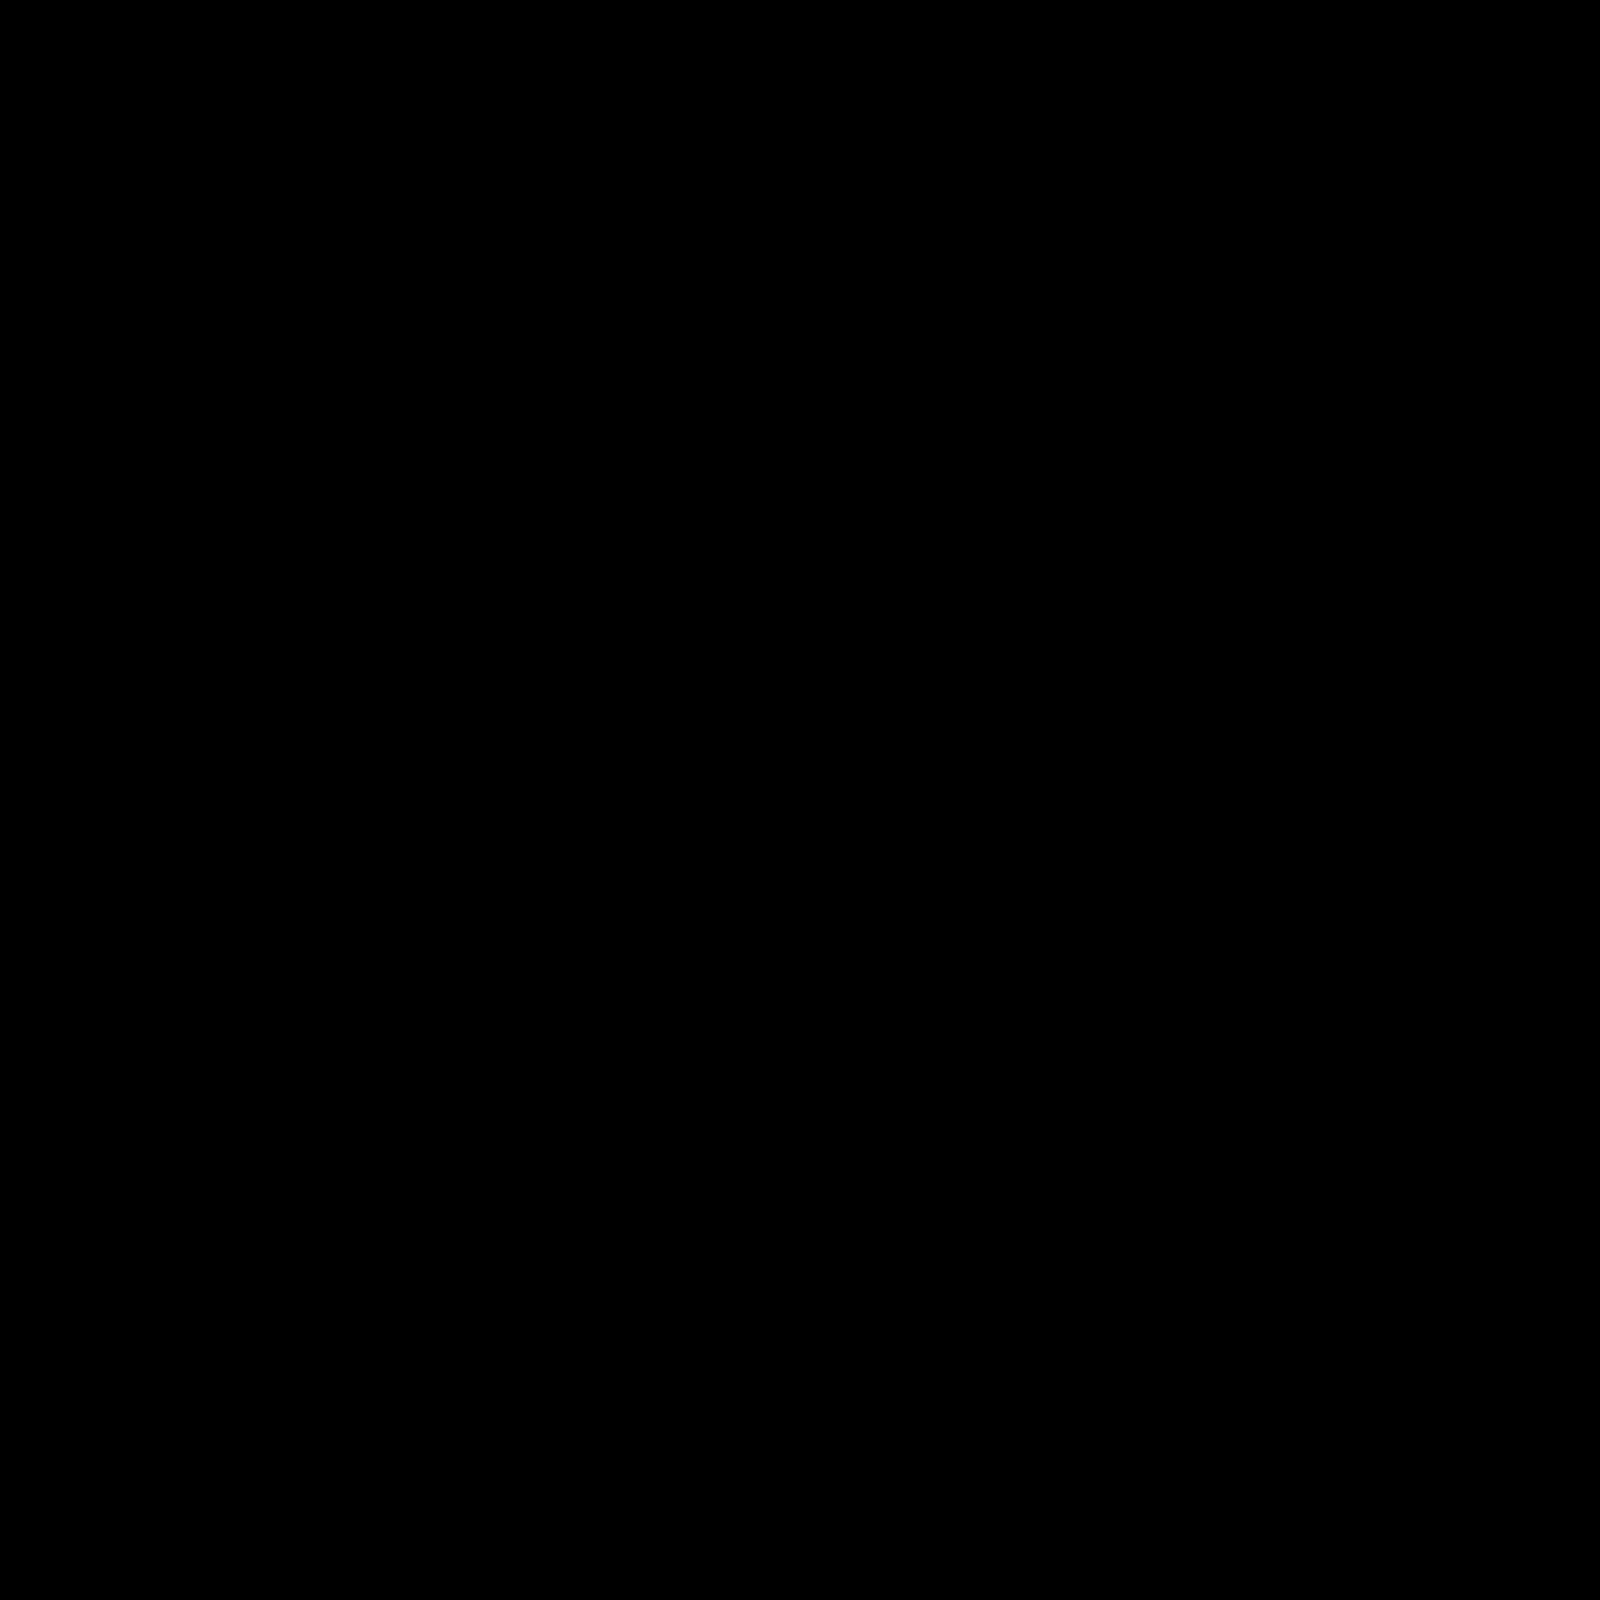 Кленовый лист картинки трафарет